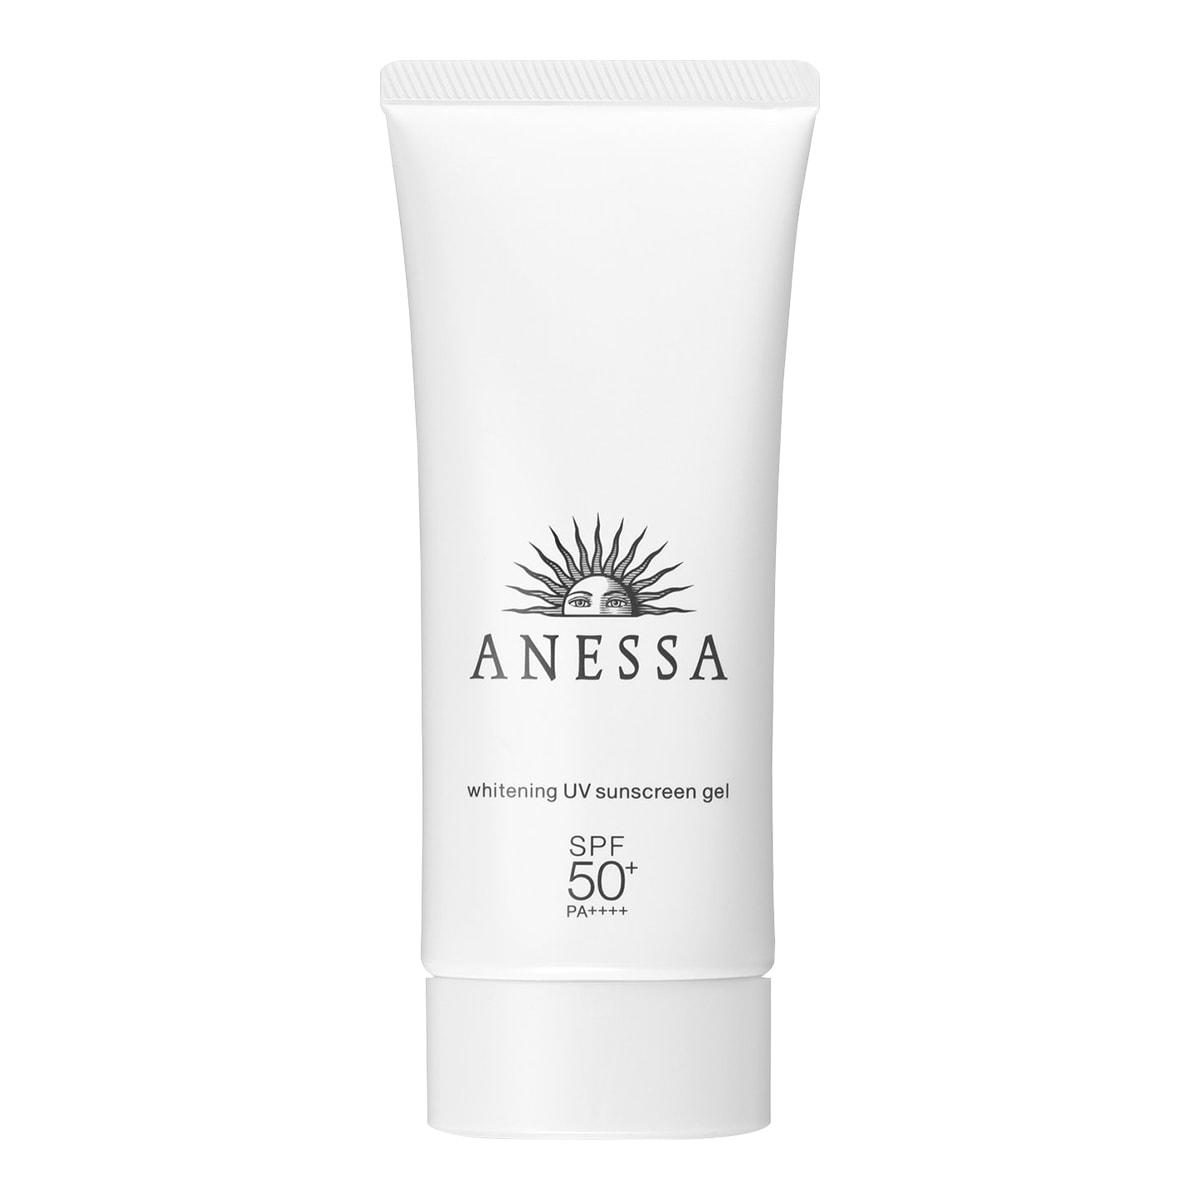 SHISEIDO ANESSA Whitening UV Sunscreen Gel SPF50+ PA++++ 90g